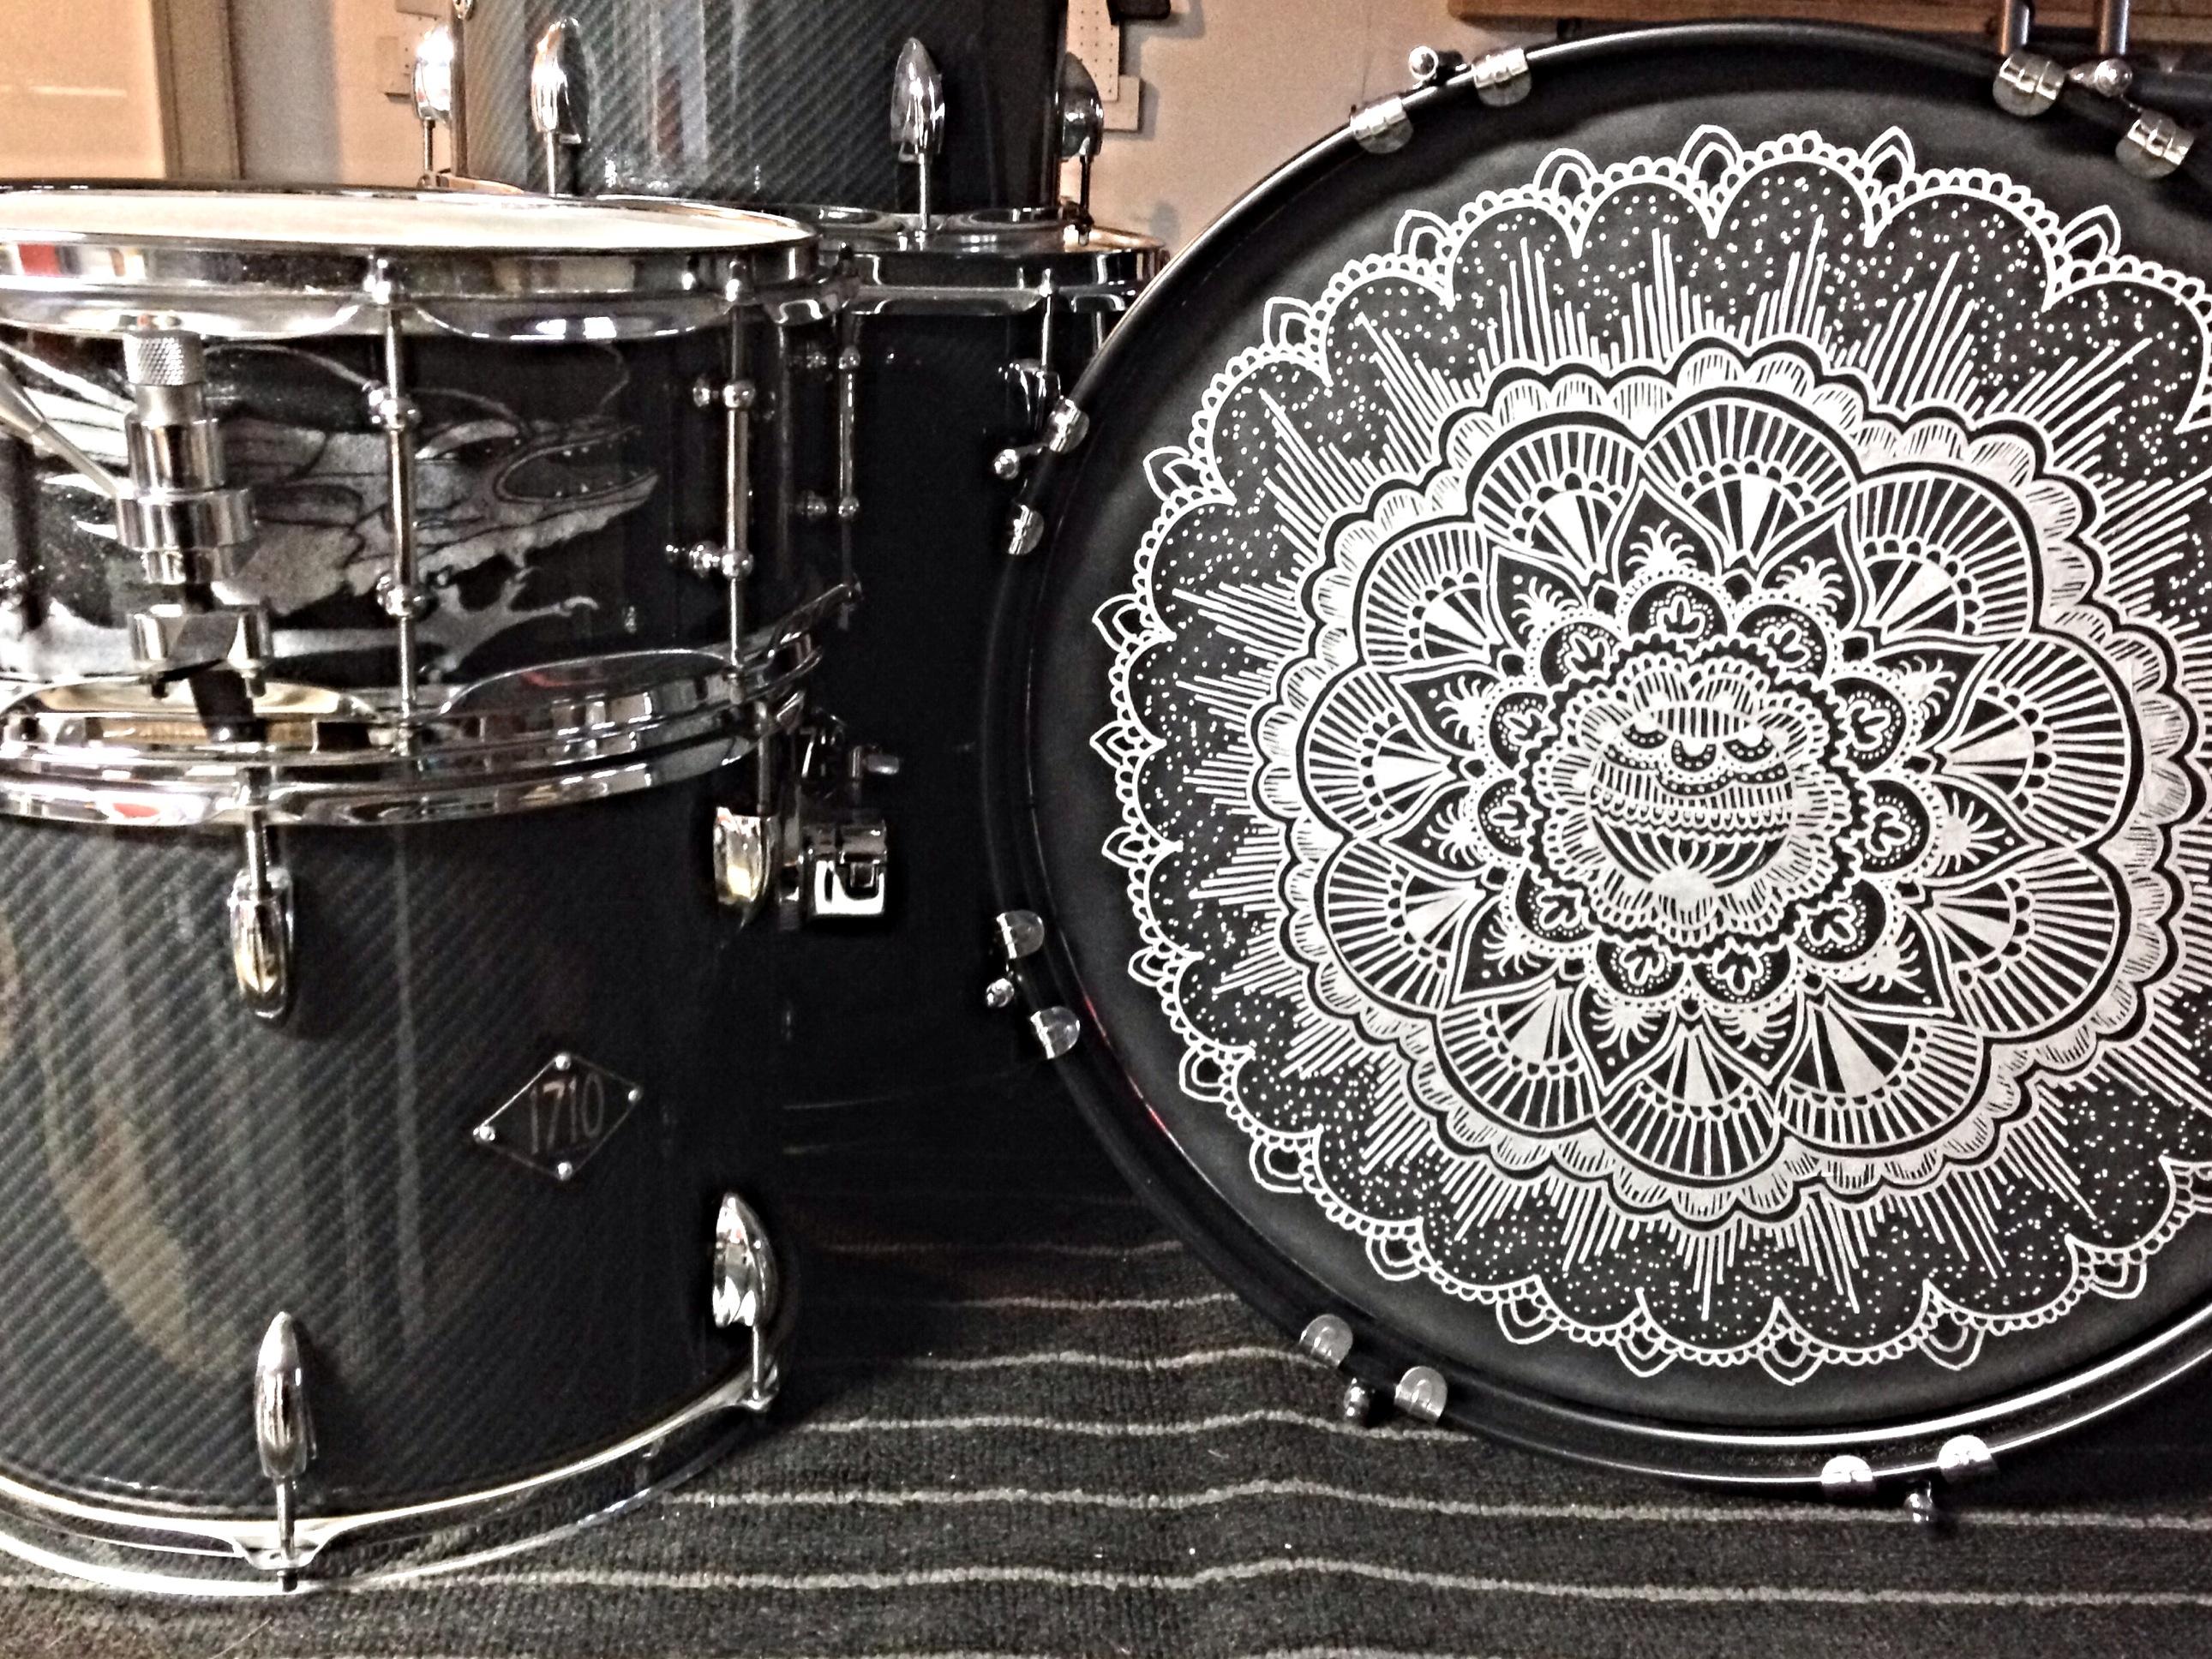 acrylic customz creates custom bass drum heads of any size modern drummer magazine. Black Bedroom Furniture Sets. Home Design Ideas